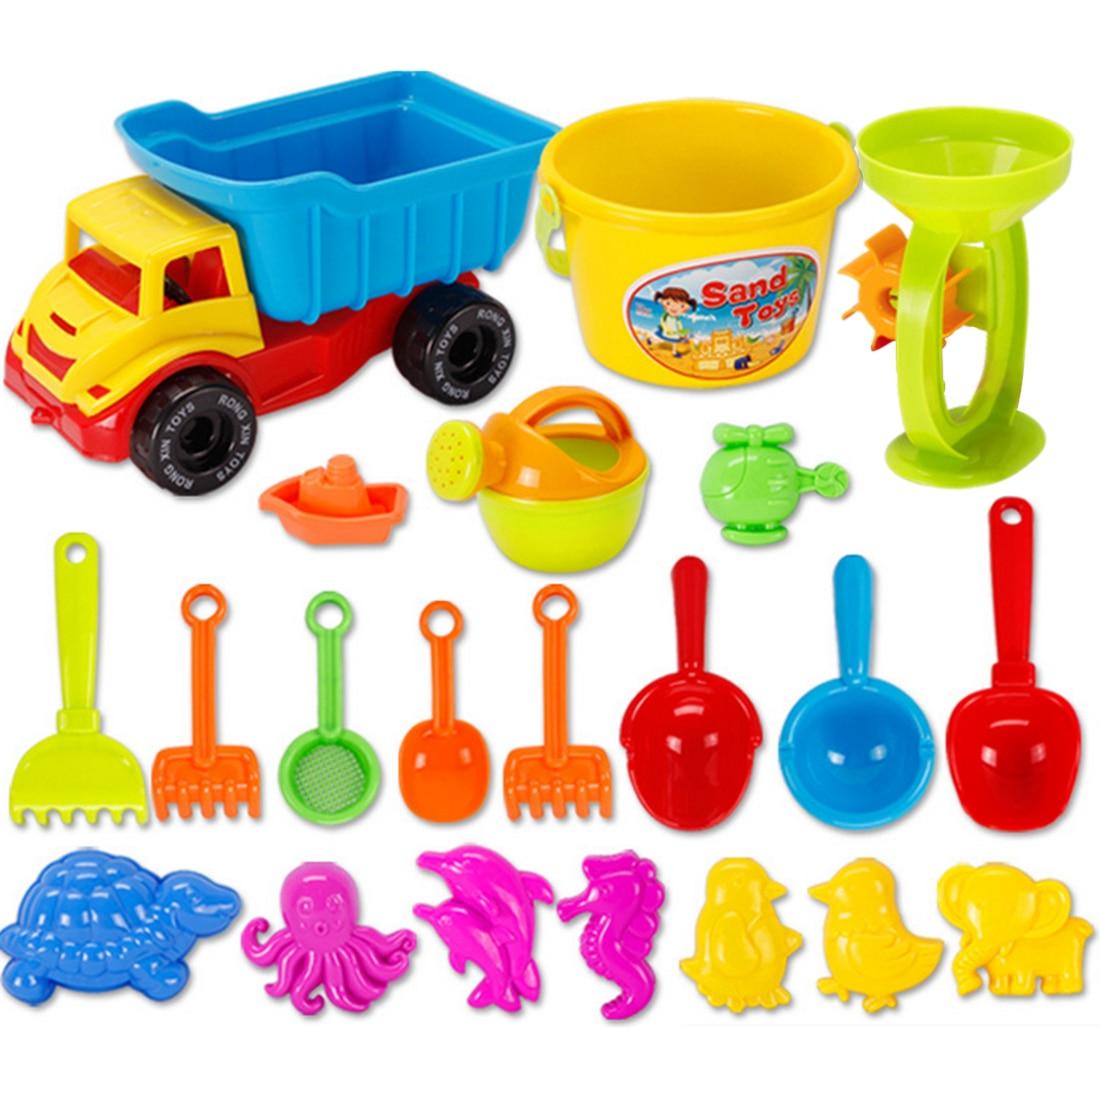 21& 31 Pieces Beach Sand Toys Set With Mesh Bag Sandbeach Toy Set Outdoor Beach Sanding Toys For Children Kids Color Random